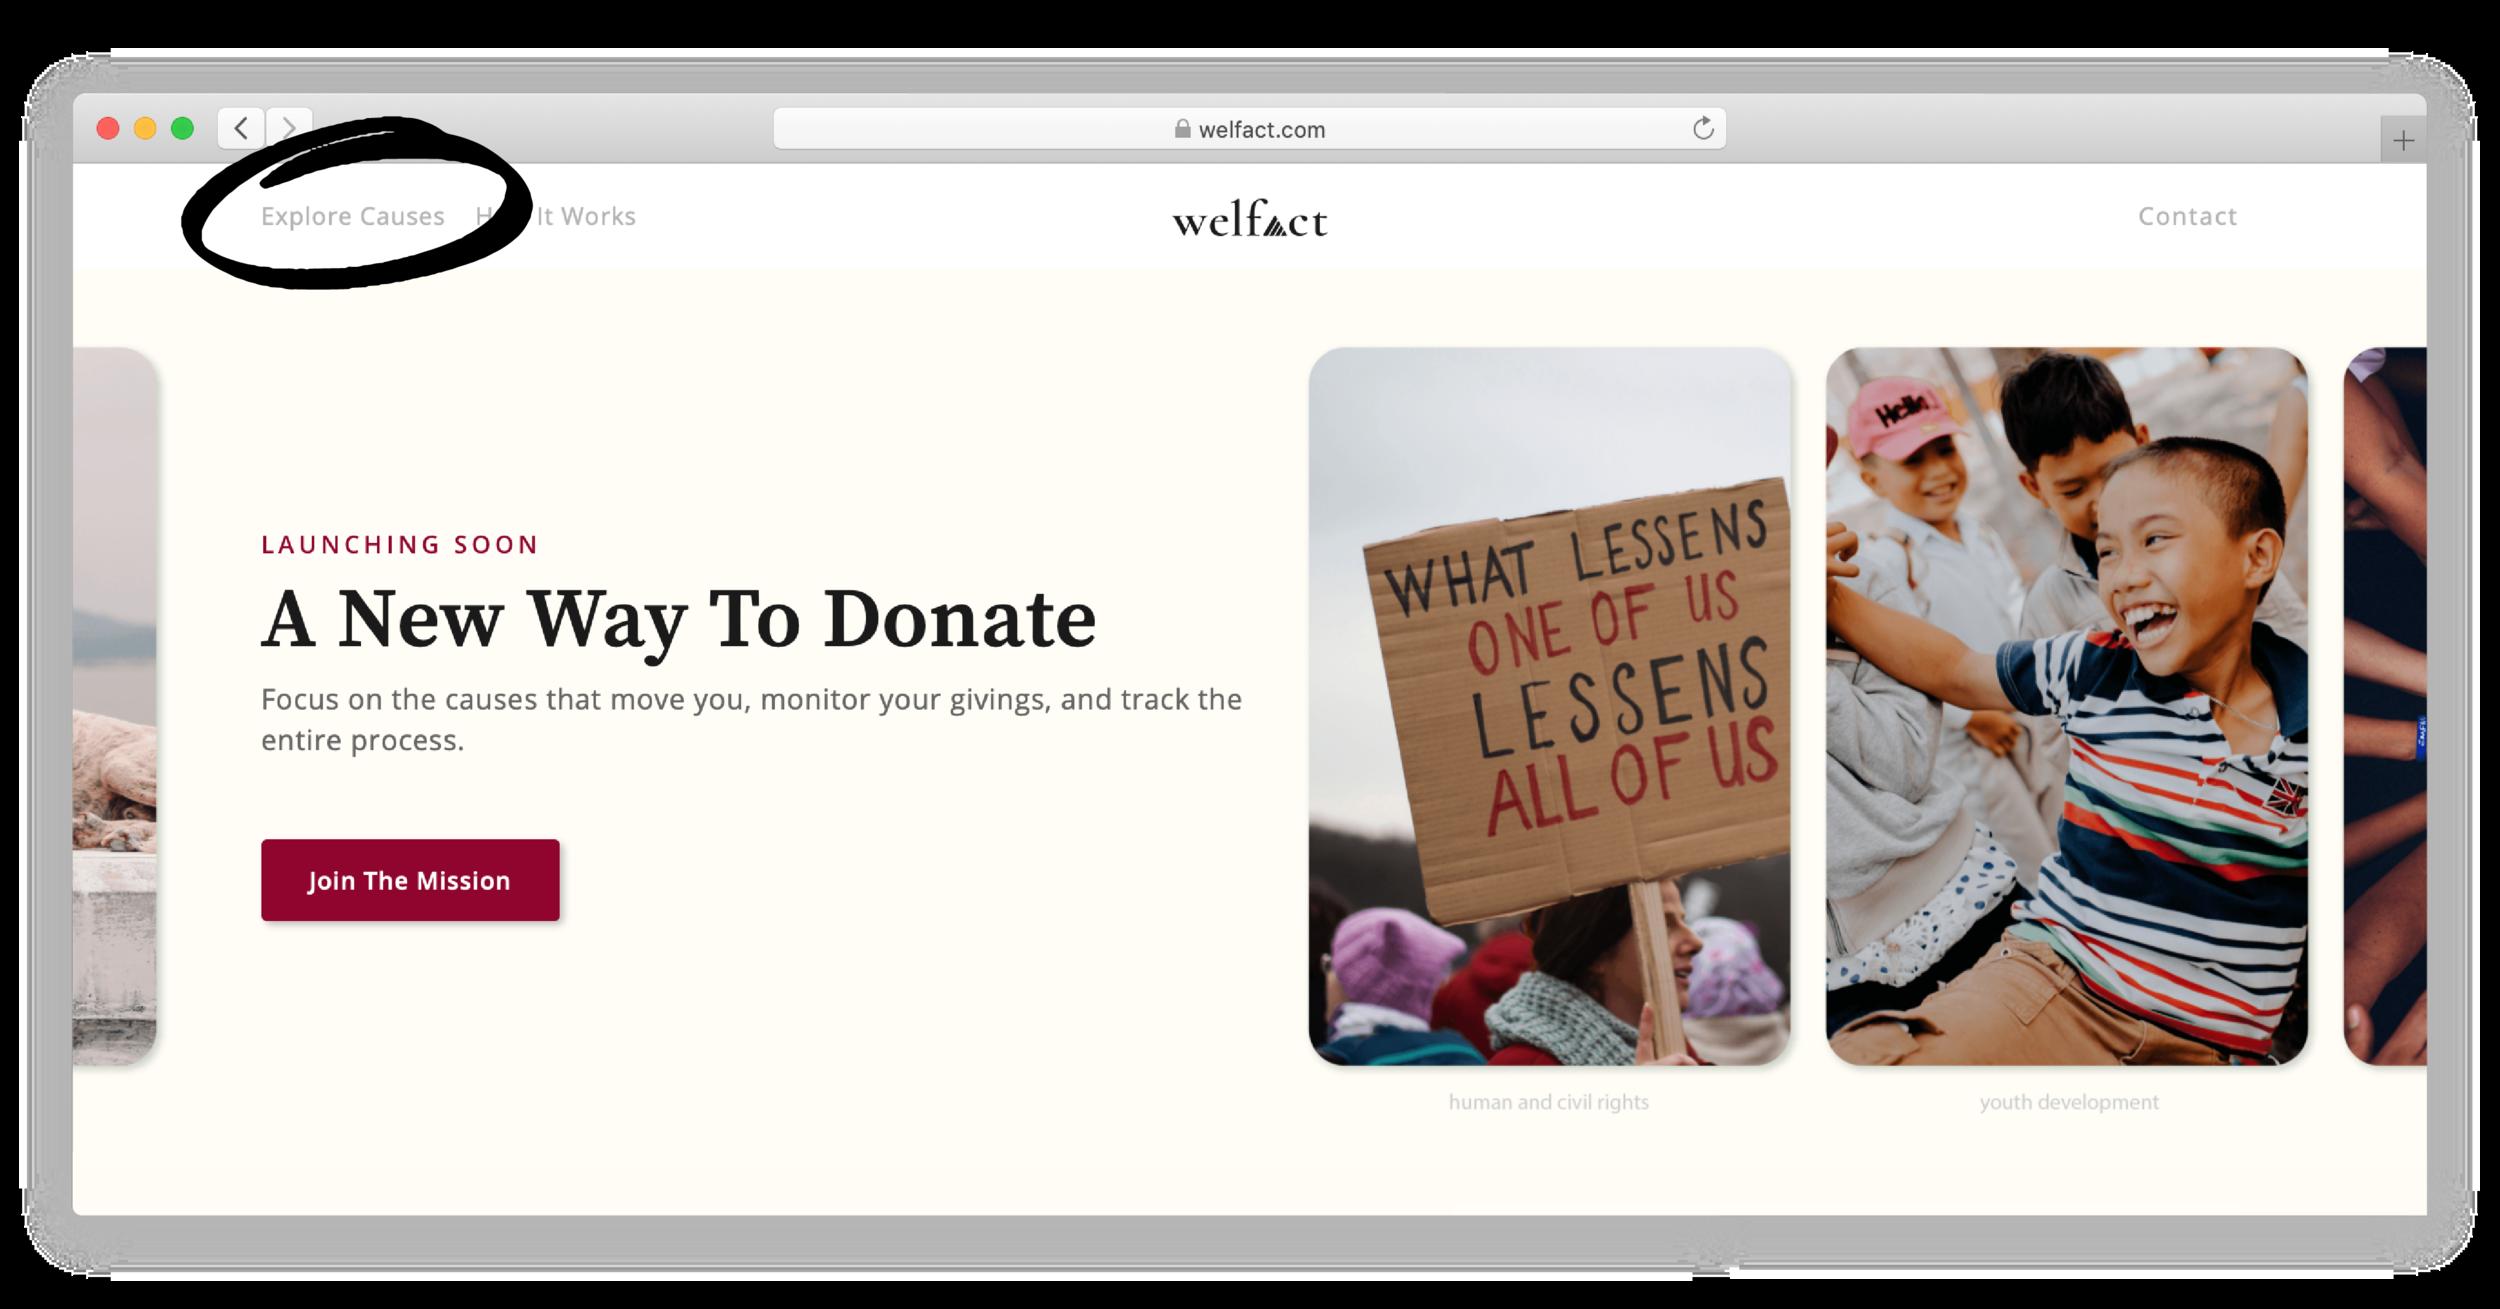 Welfact Marketing Website - New Tab